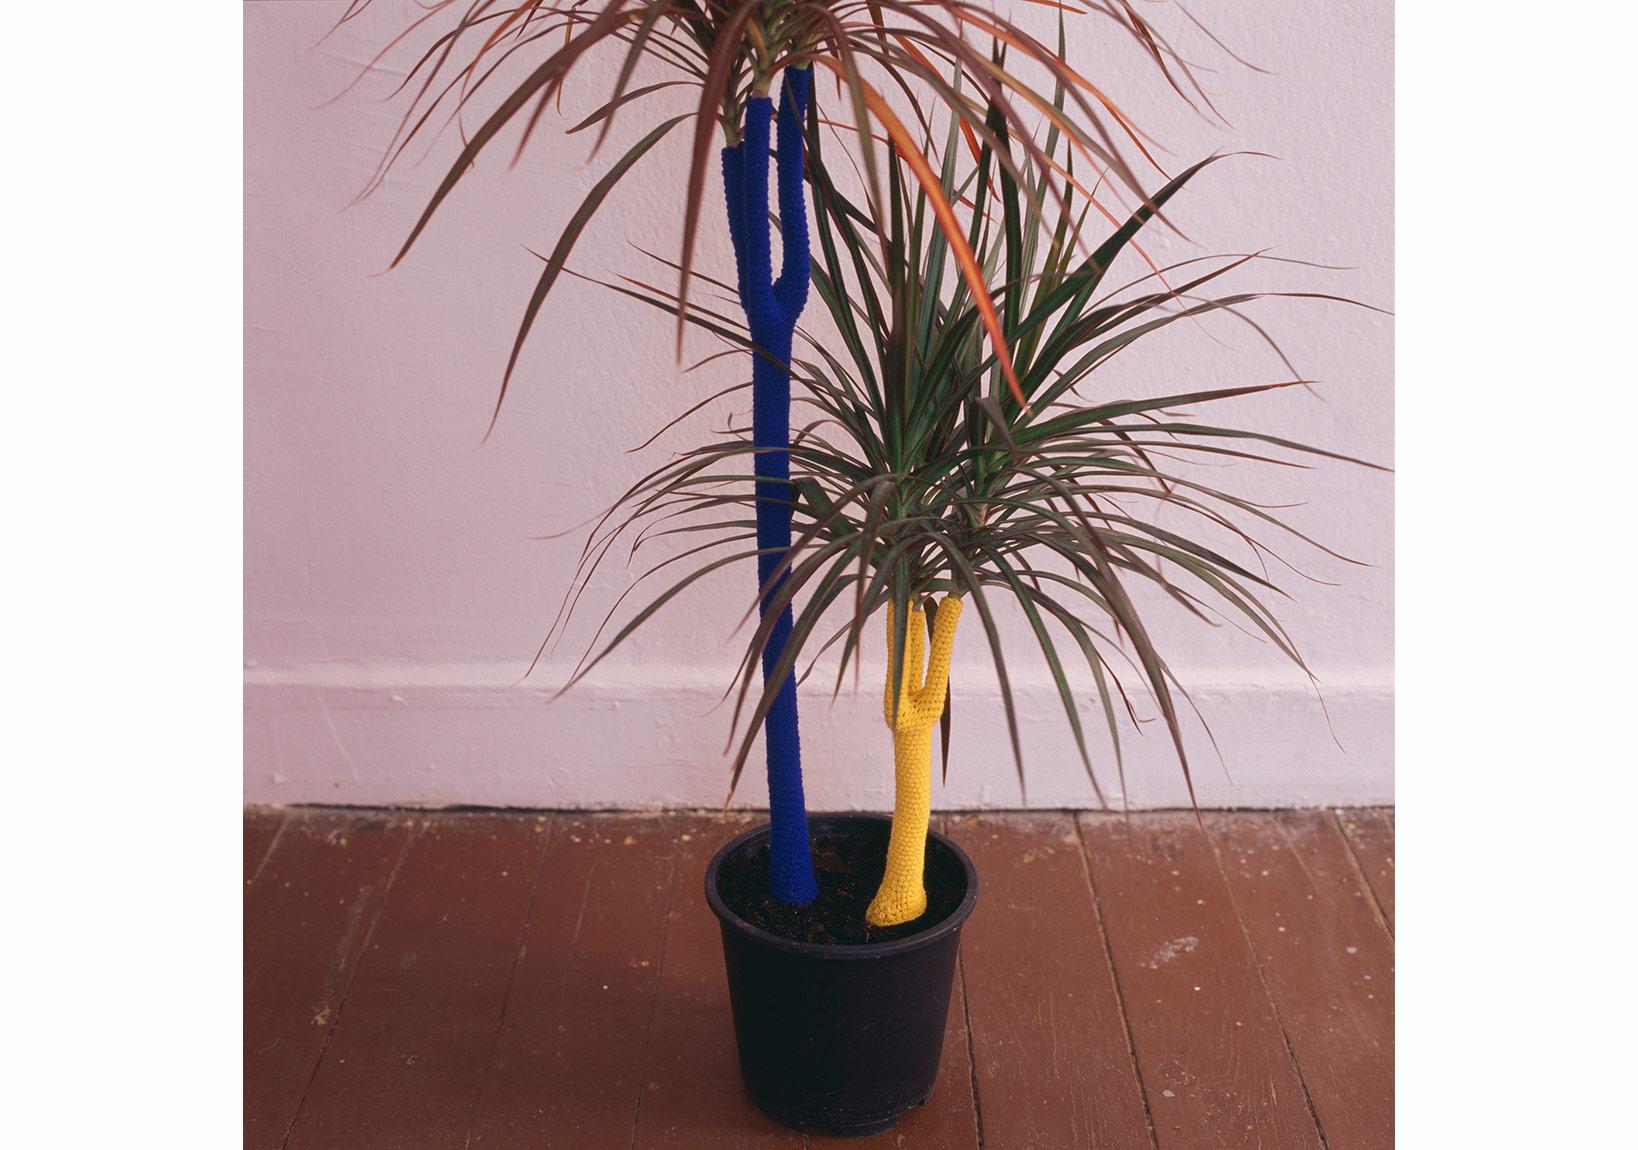 Servet Koçyiğit 2005 - Blue Side Up 9, Istanbul Bienali